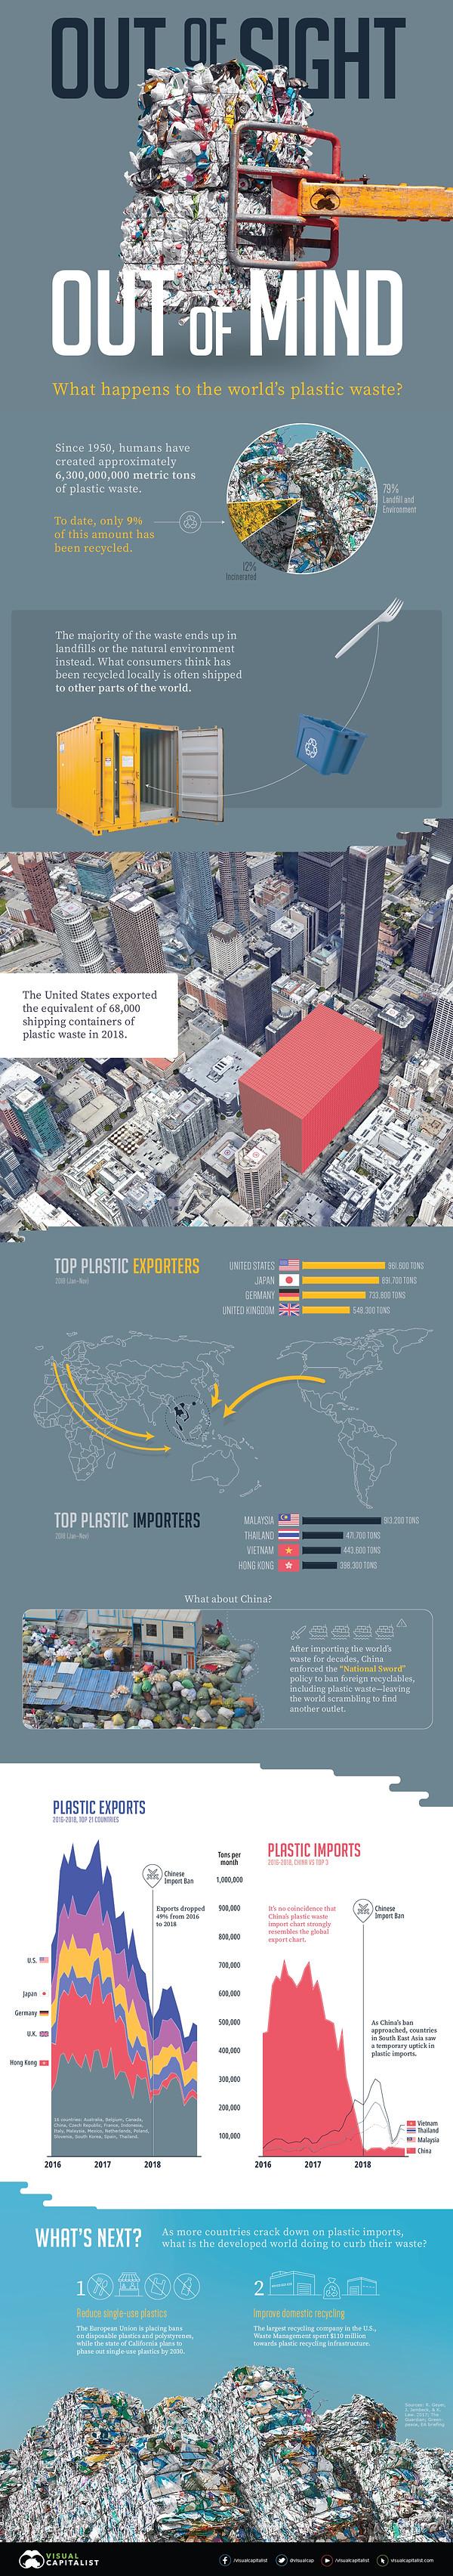 plastic-exports-1.jpg